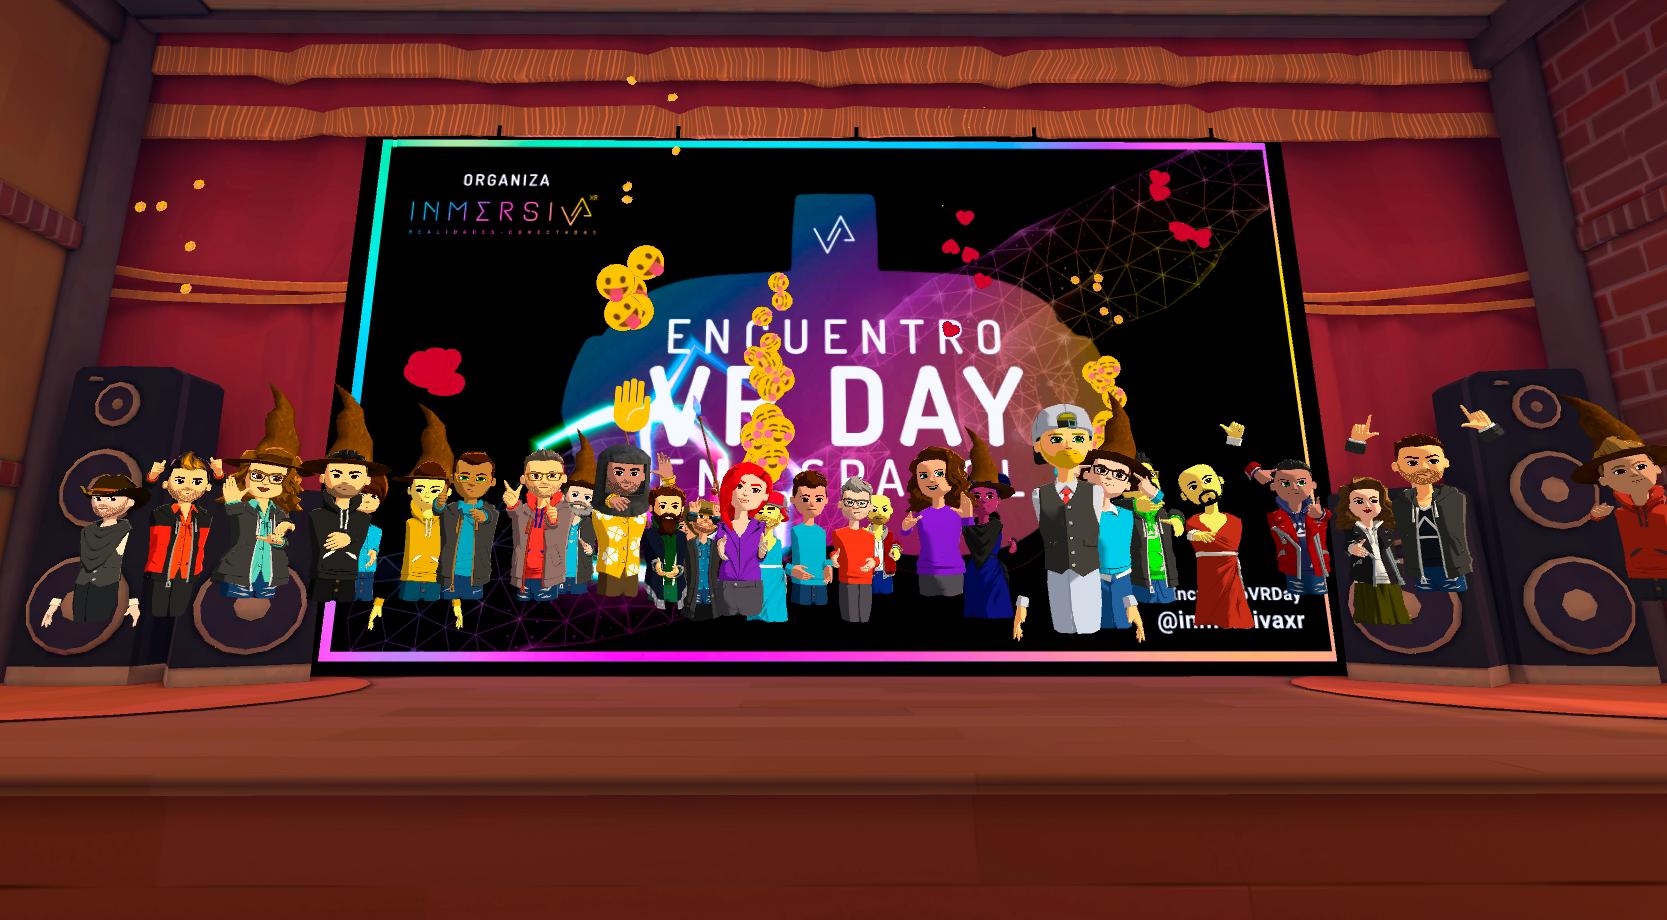 #EncuentroVRDay2020